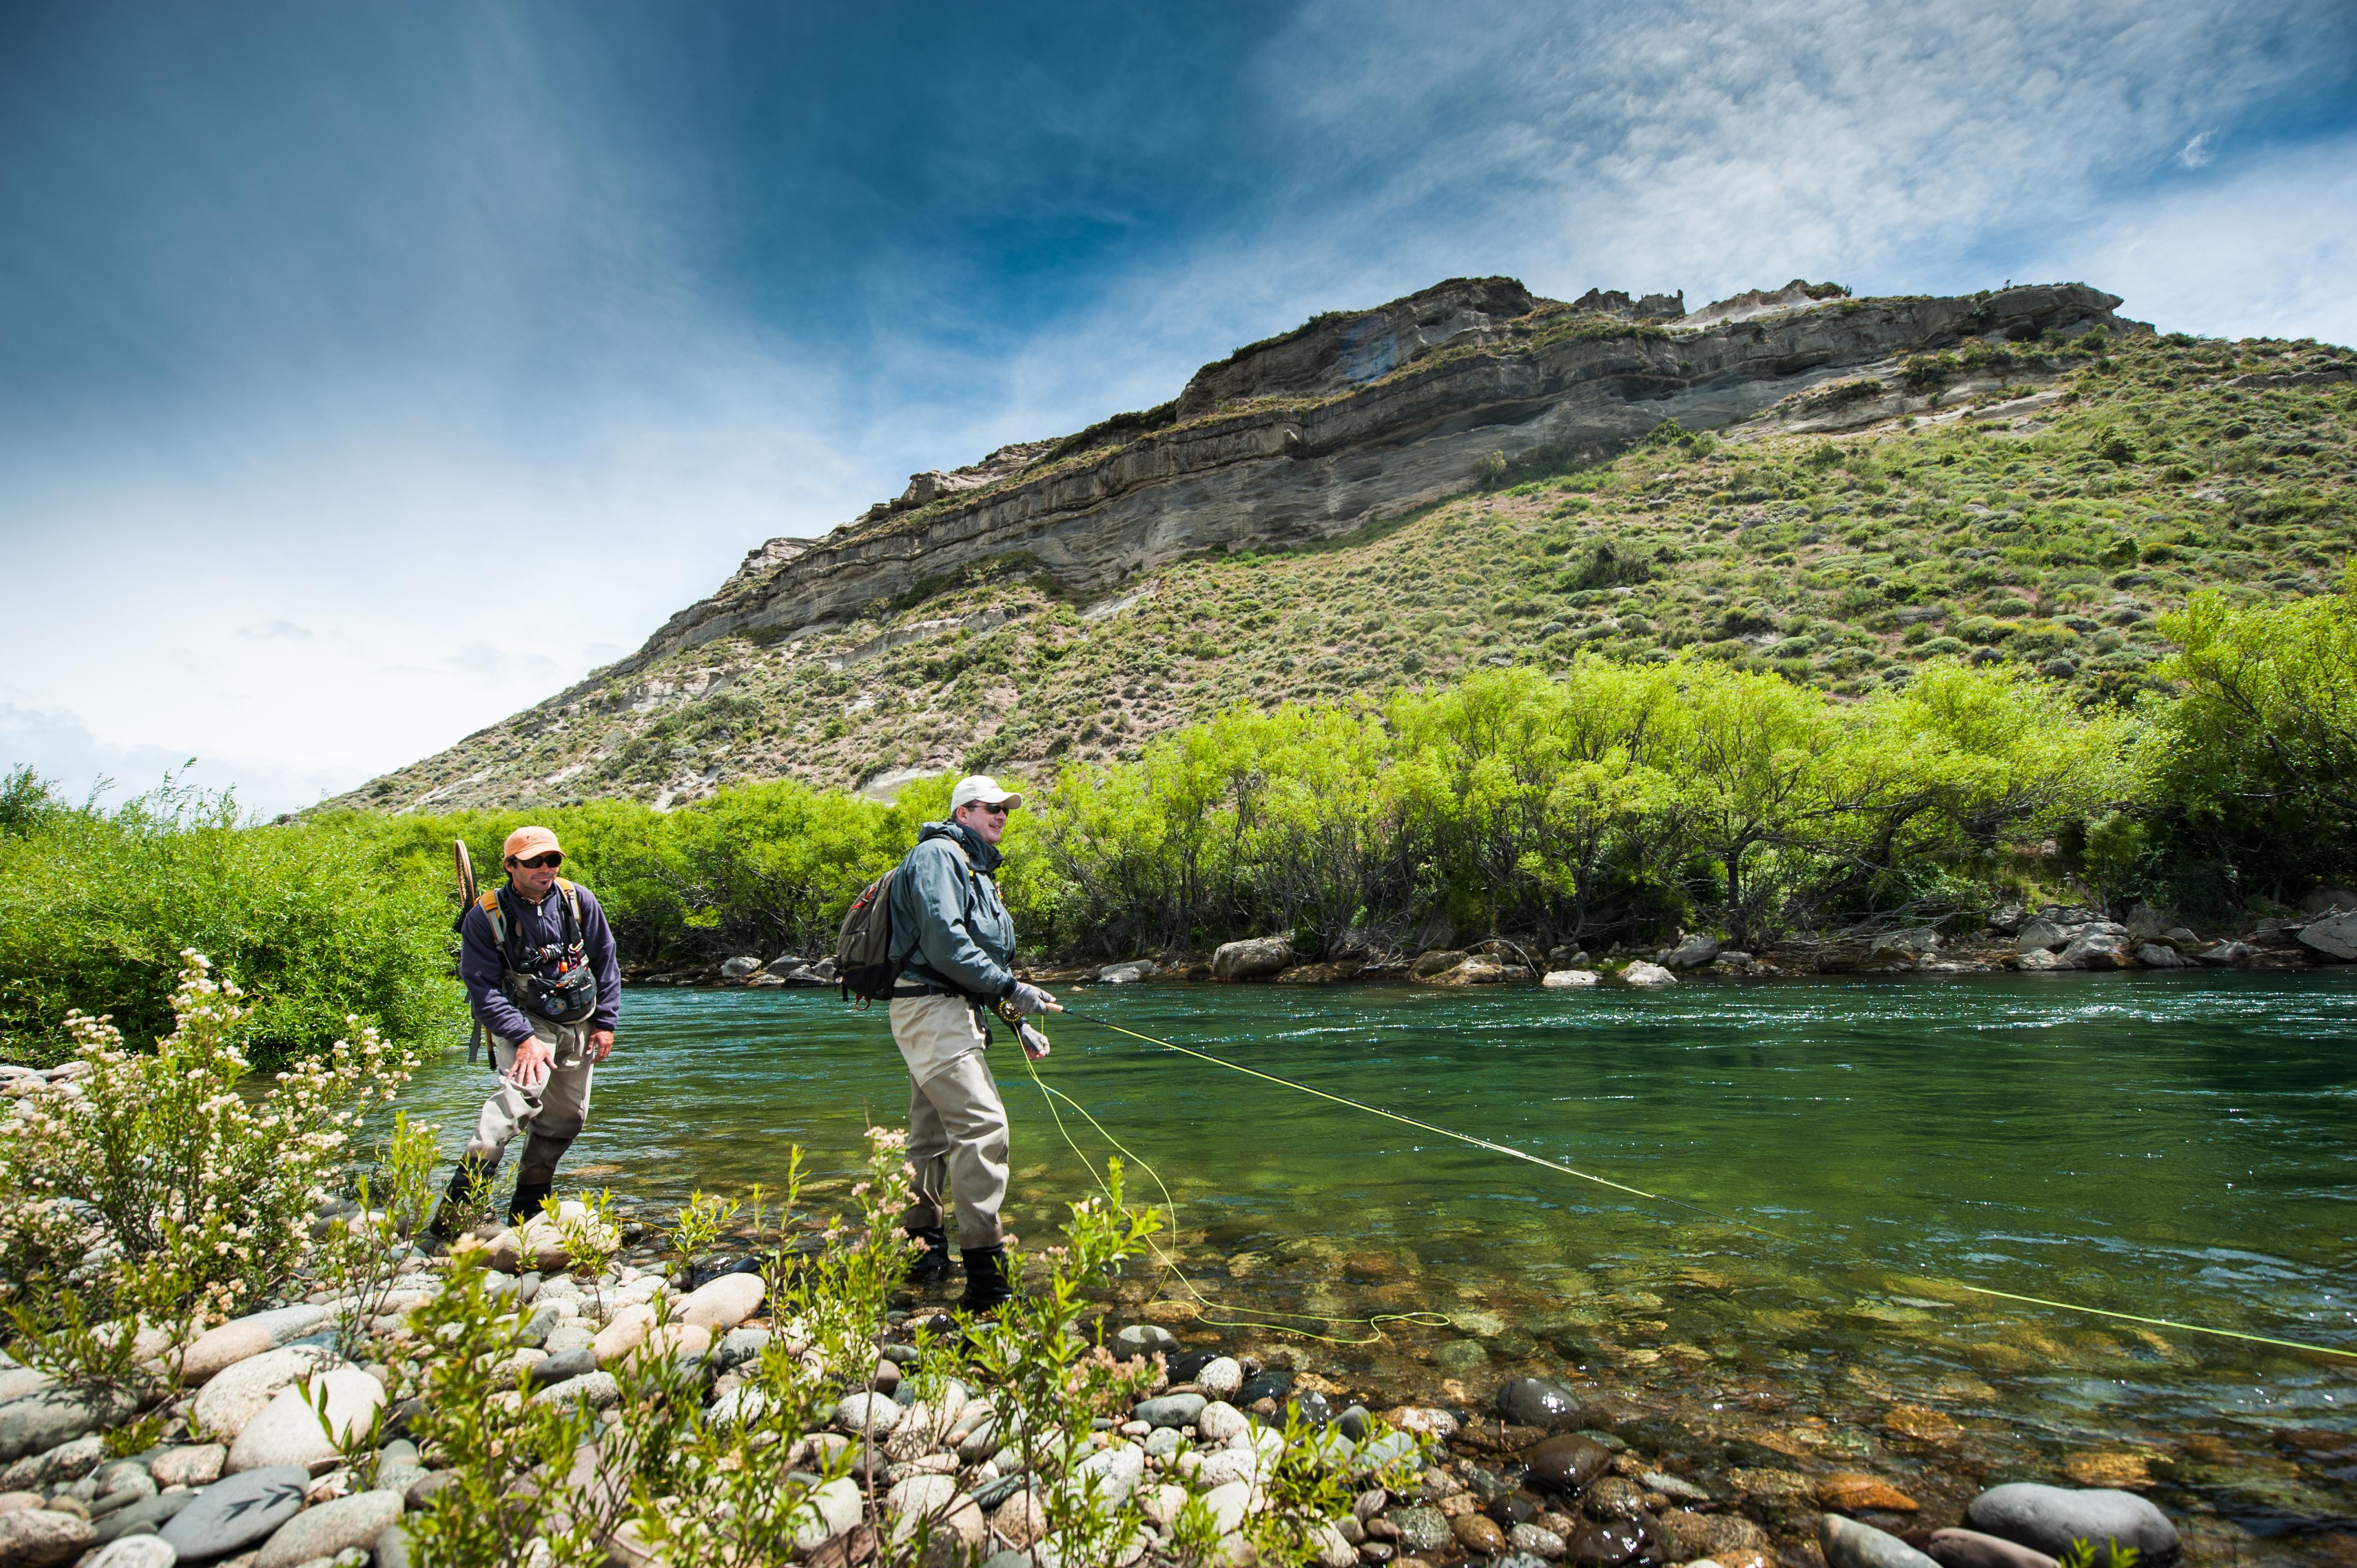 Tipiliuke lodge chimehu n river fly fishing patagonia for Fly fishing patagonia